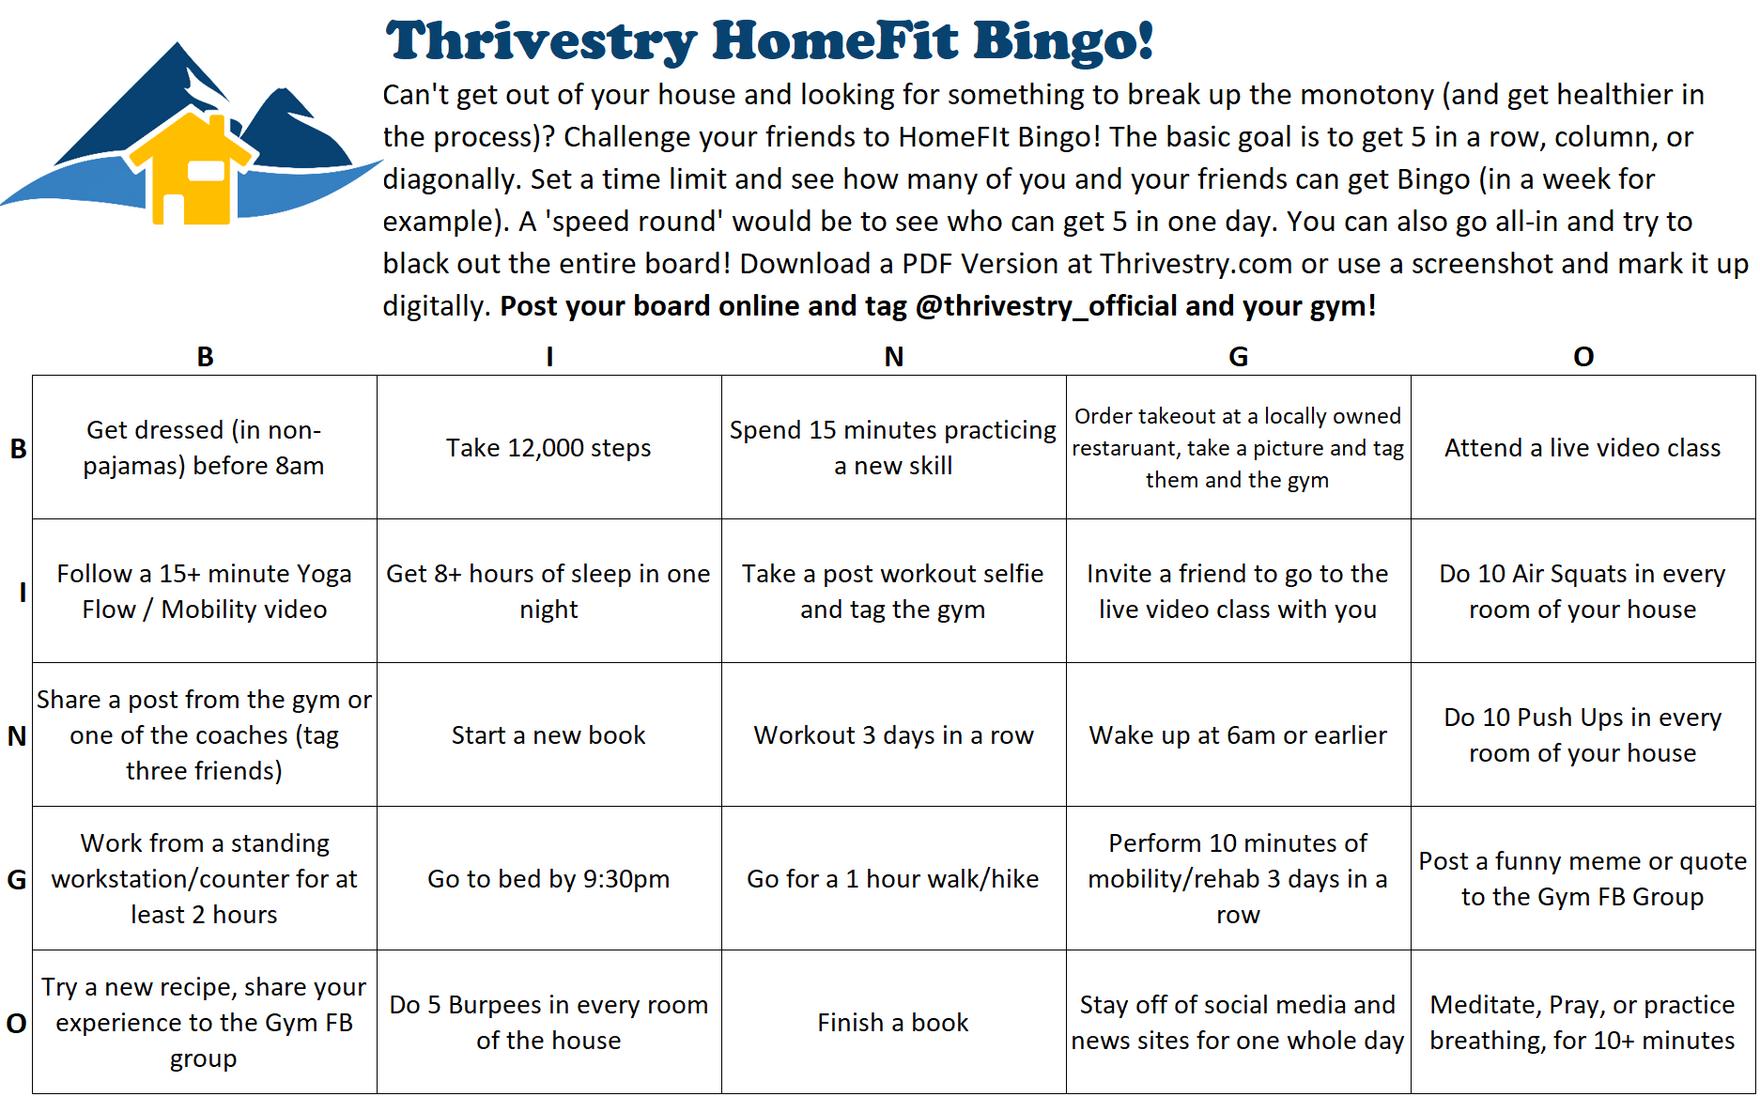 Thrivestry HomeFit Bingo Jpeg